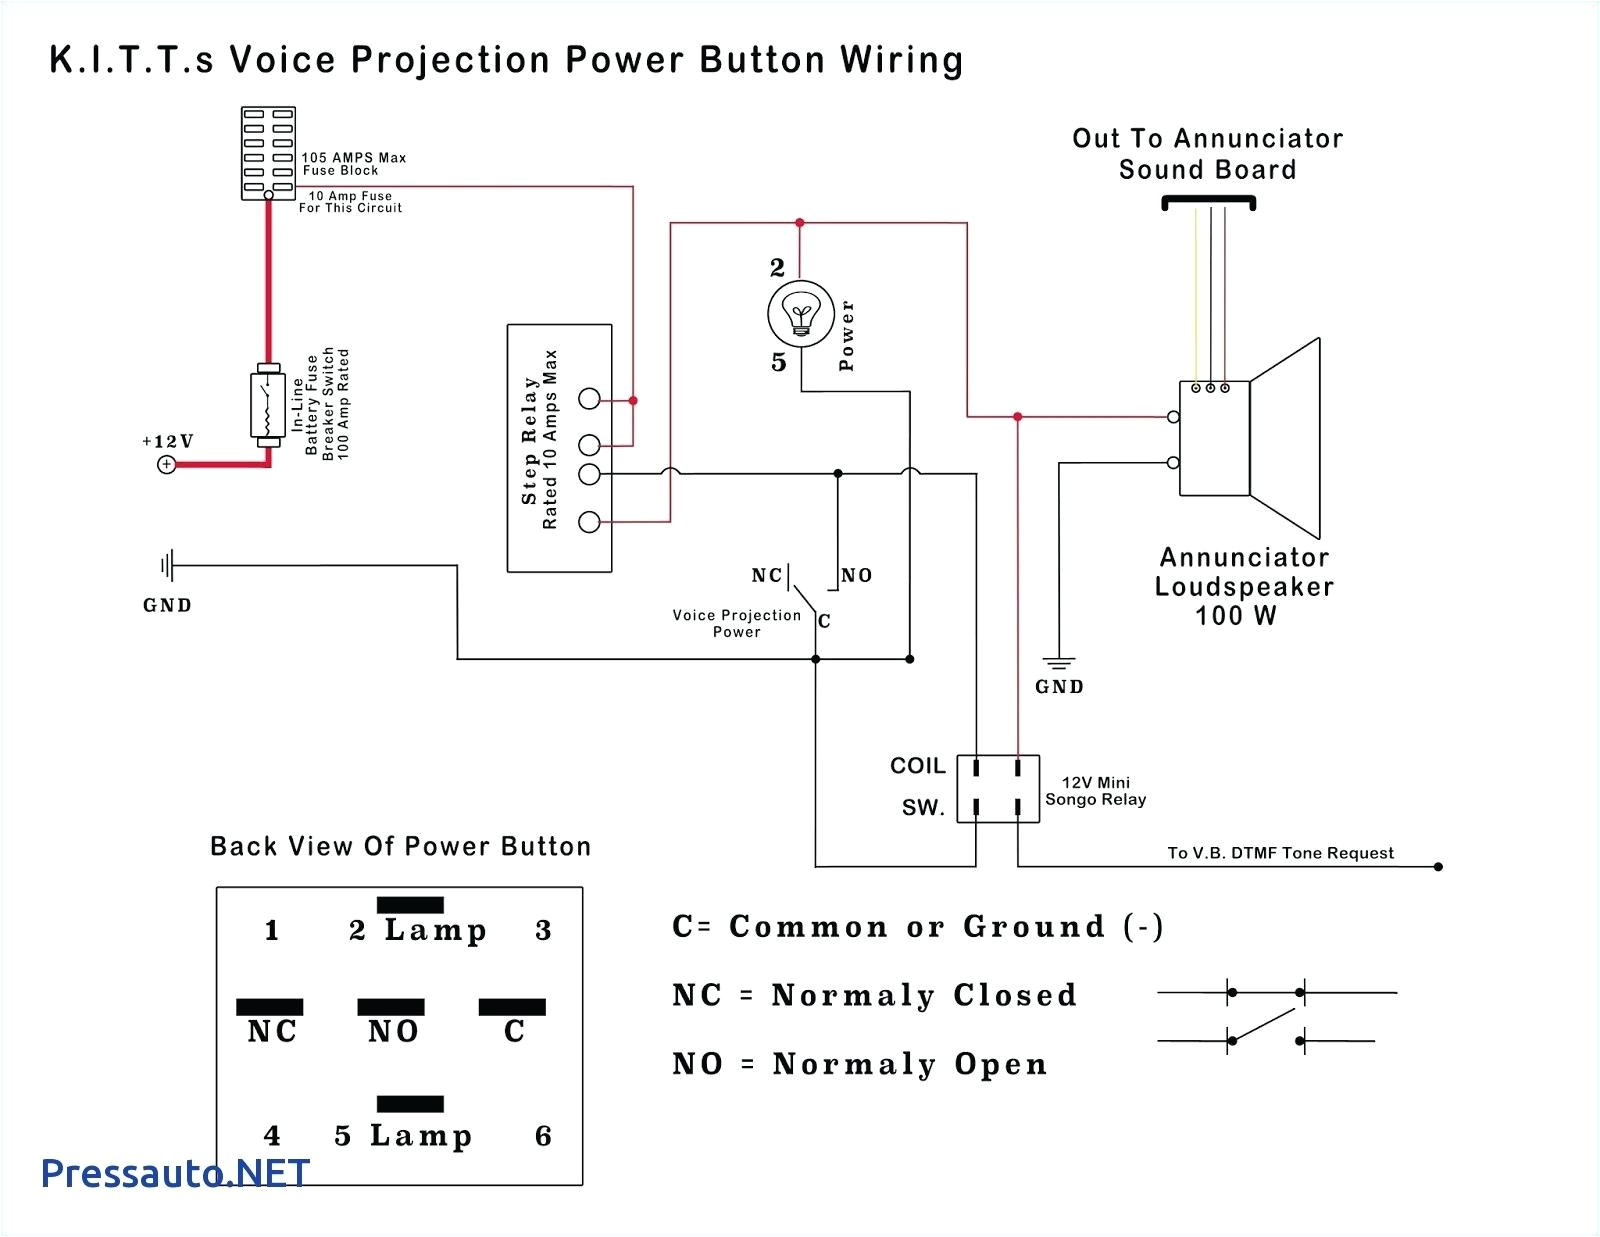 97 f350 gpr wiring diagram wiring diagram options 97 f350 gpr wiring diagram